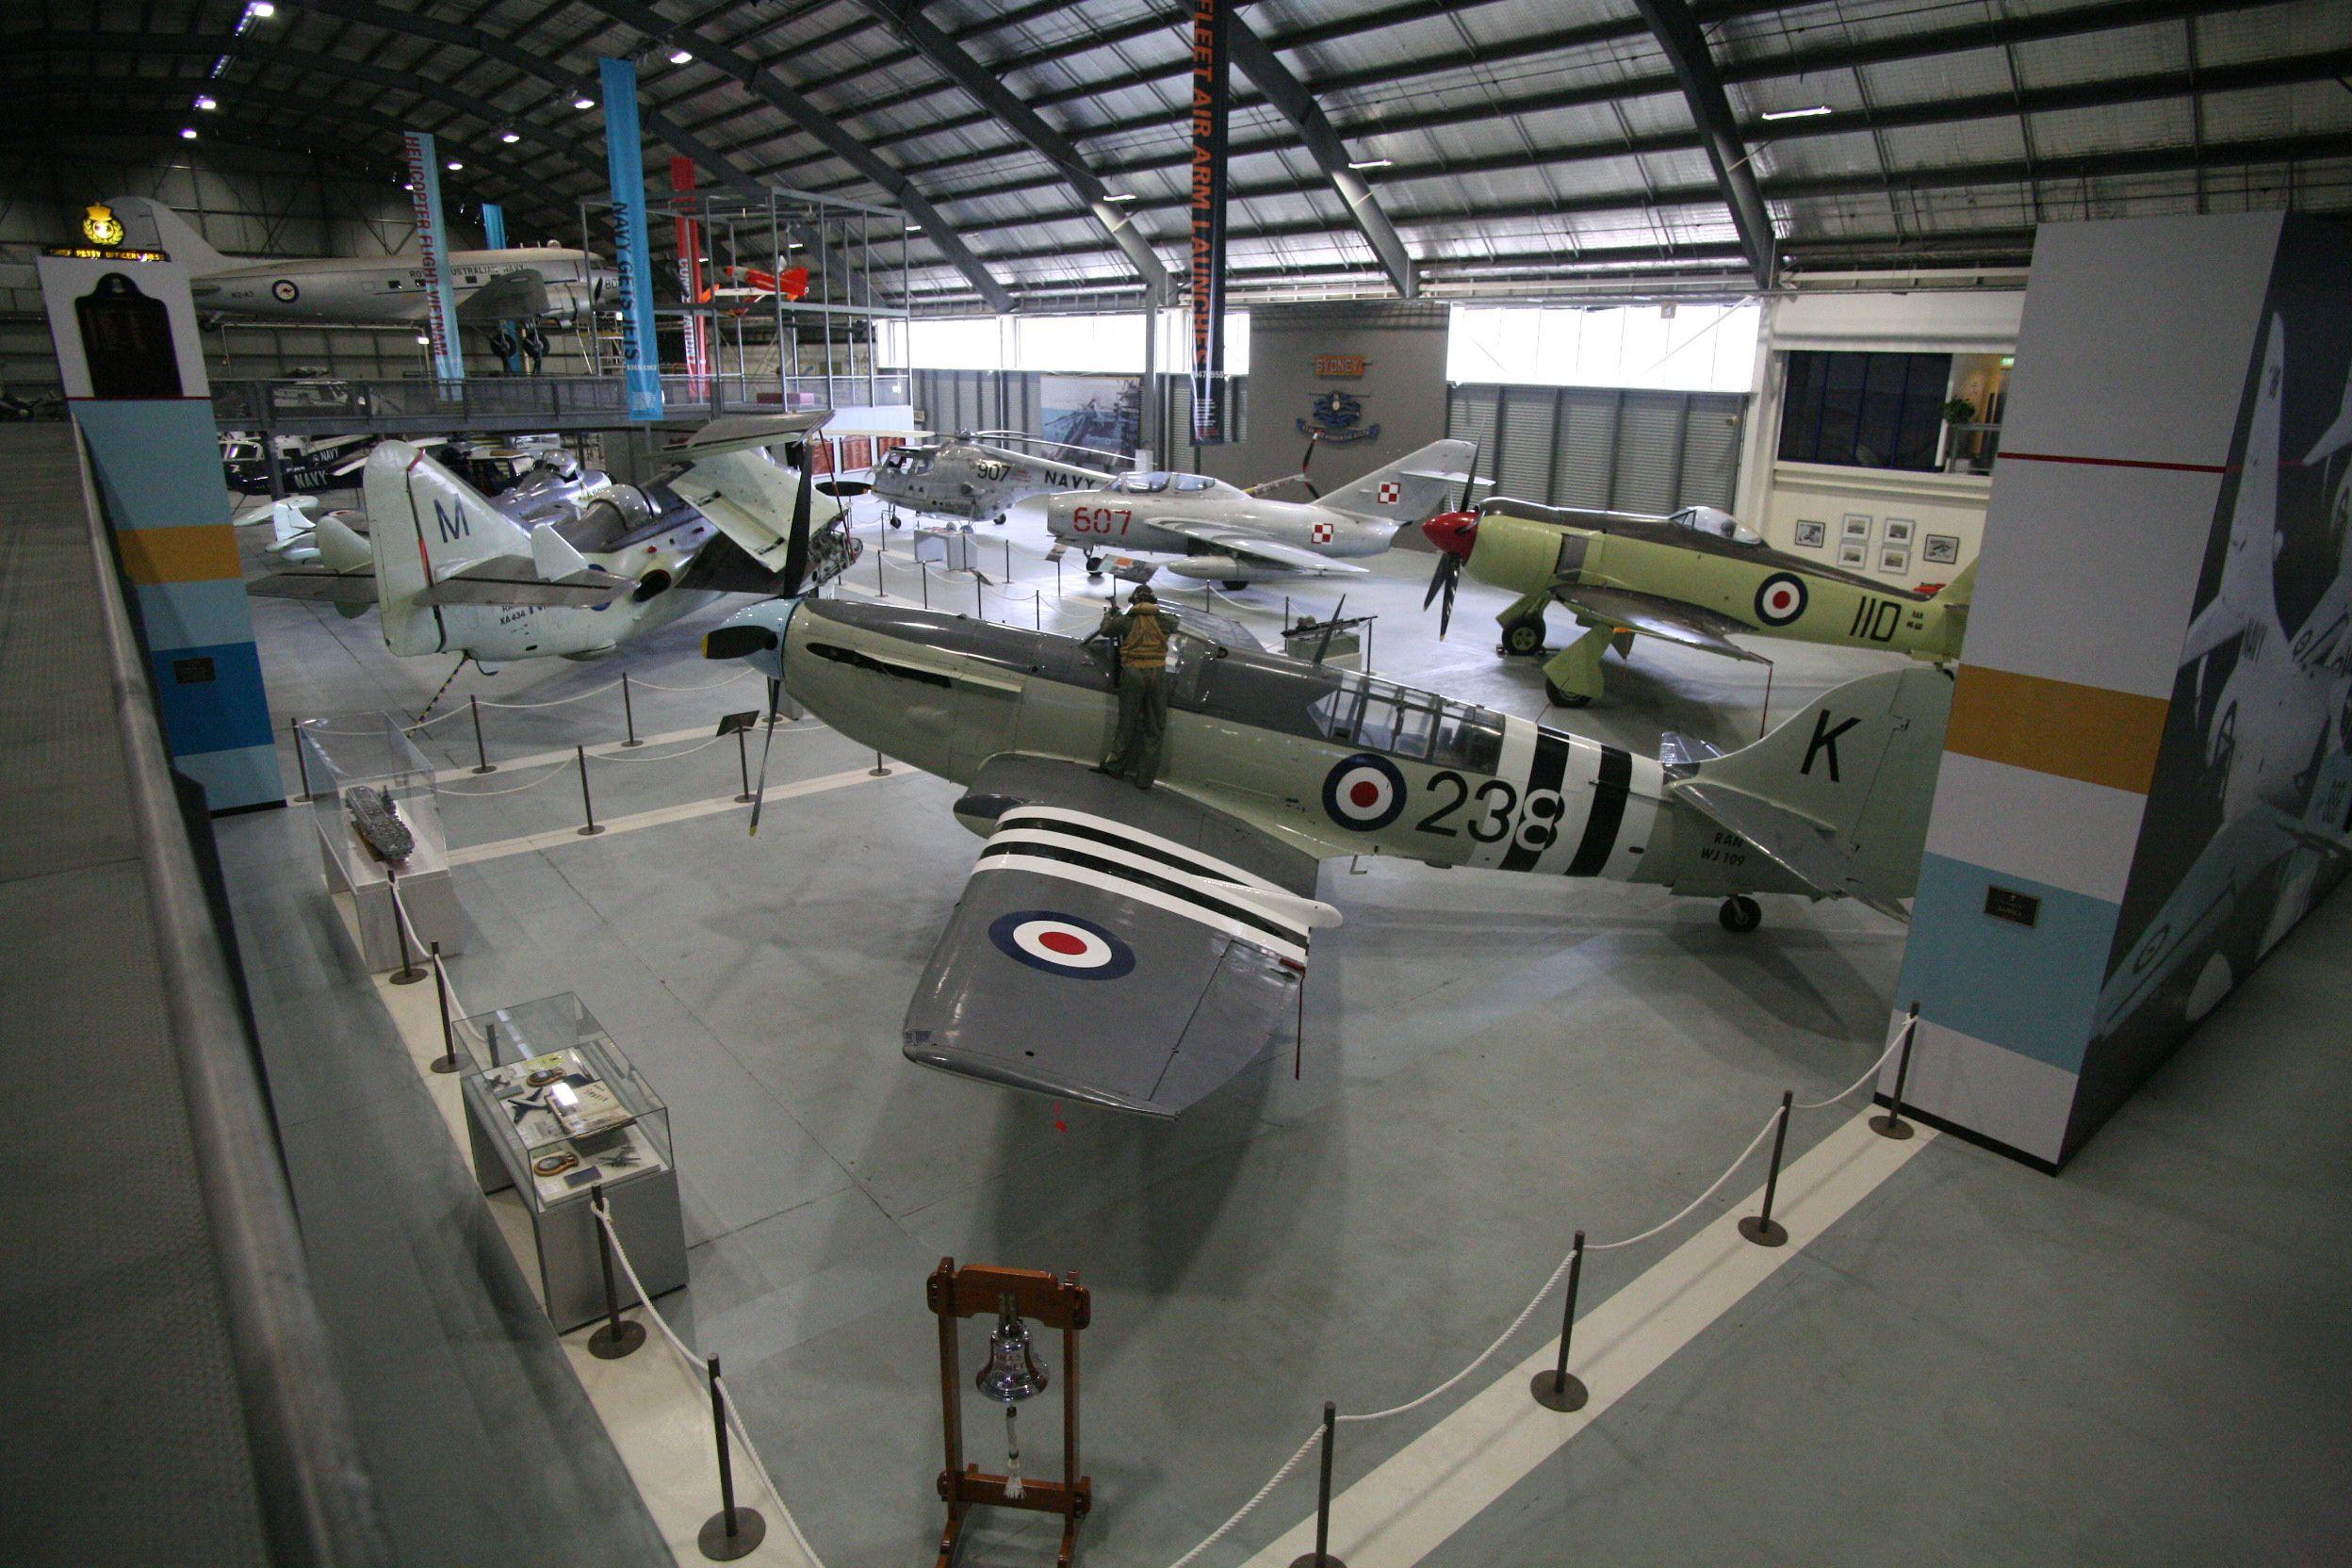 Former Royal Australian Navy Fairey Firefly at the